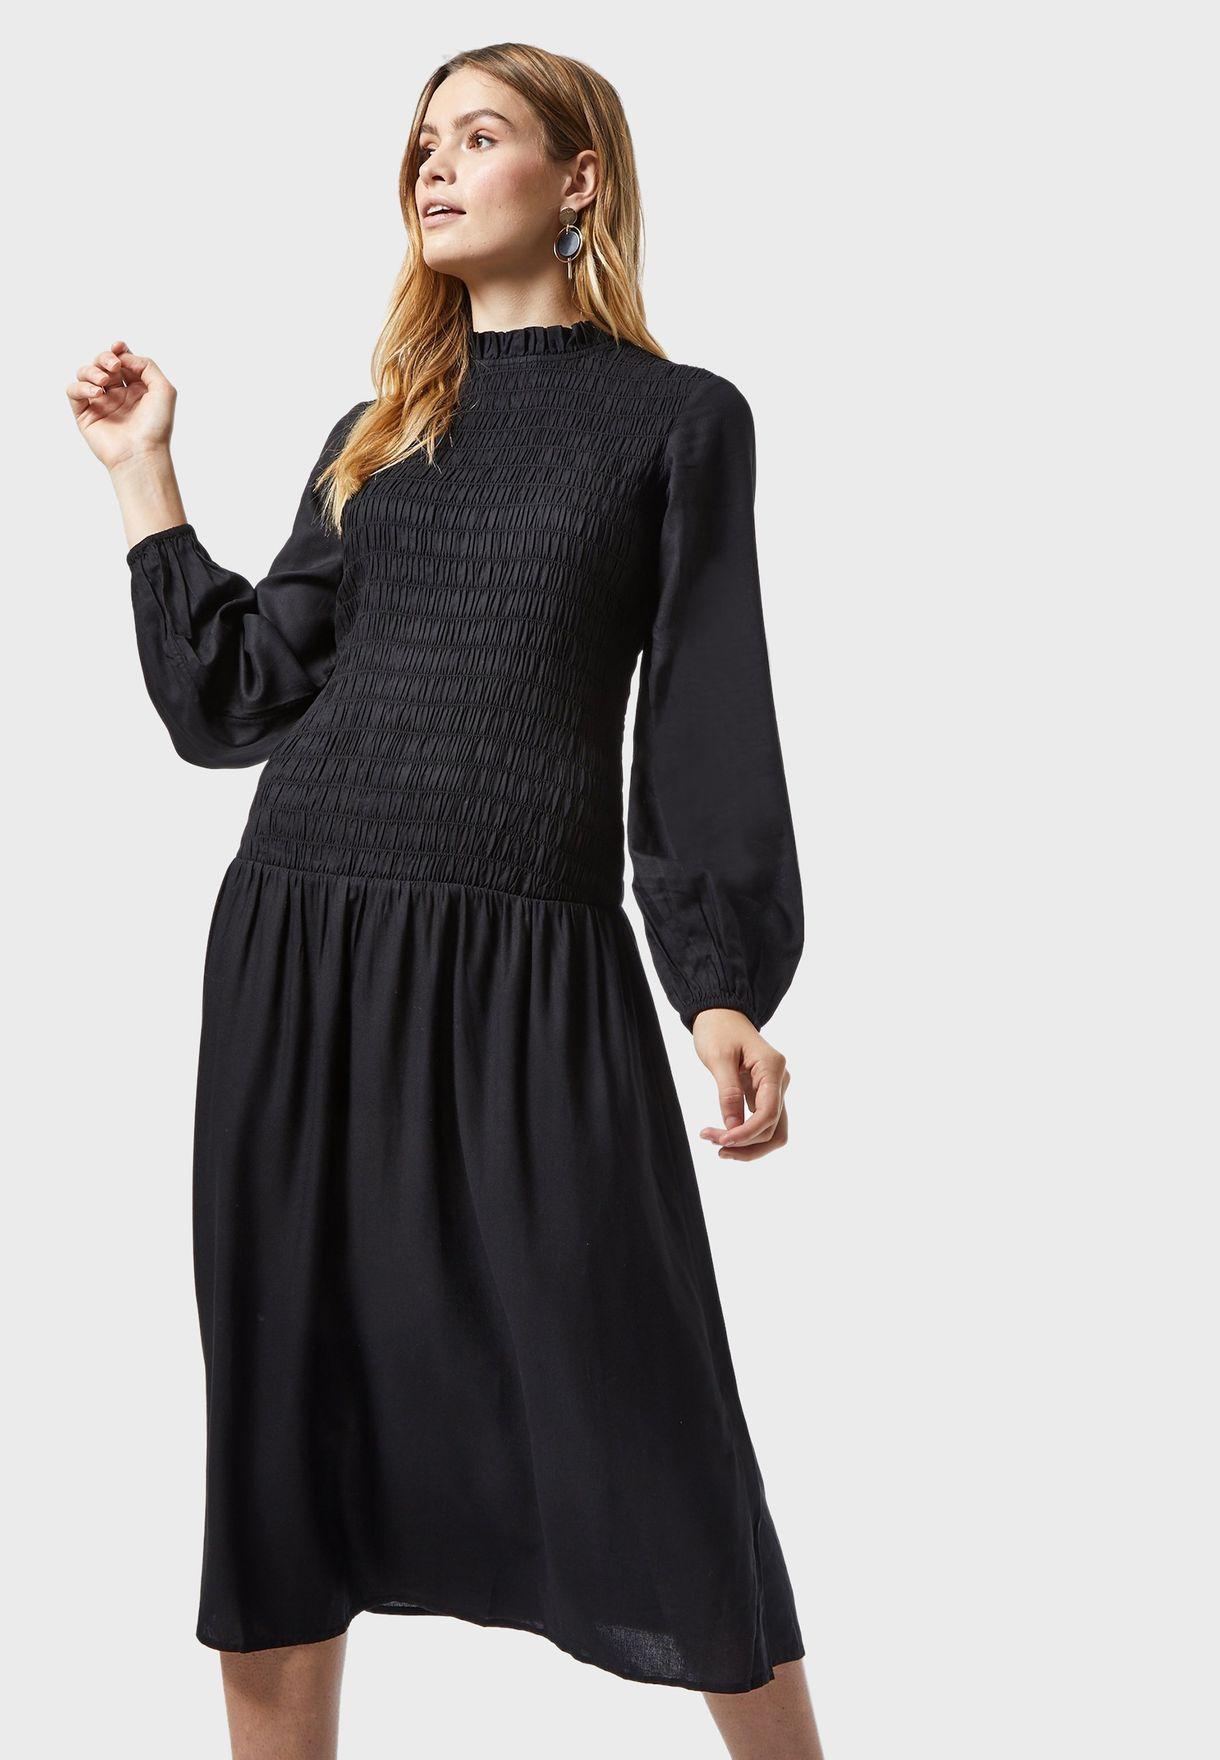 Shirred Pleated Dress